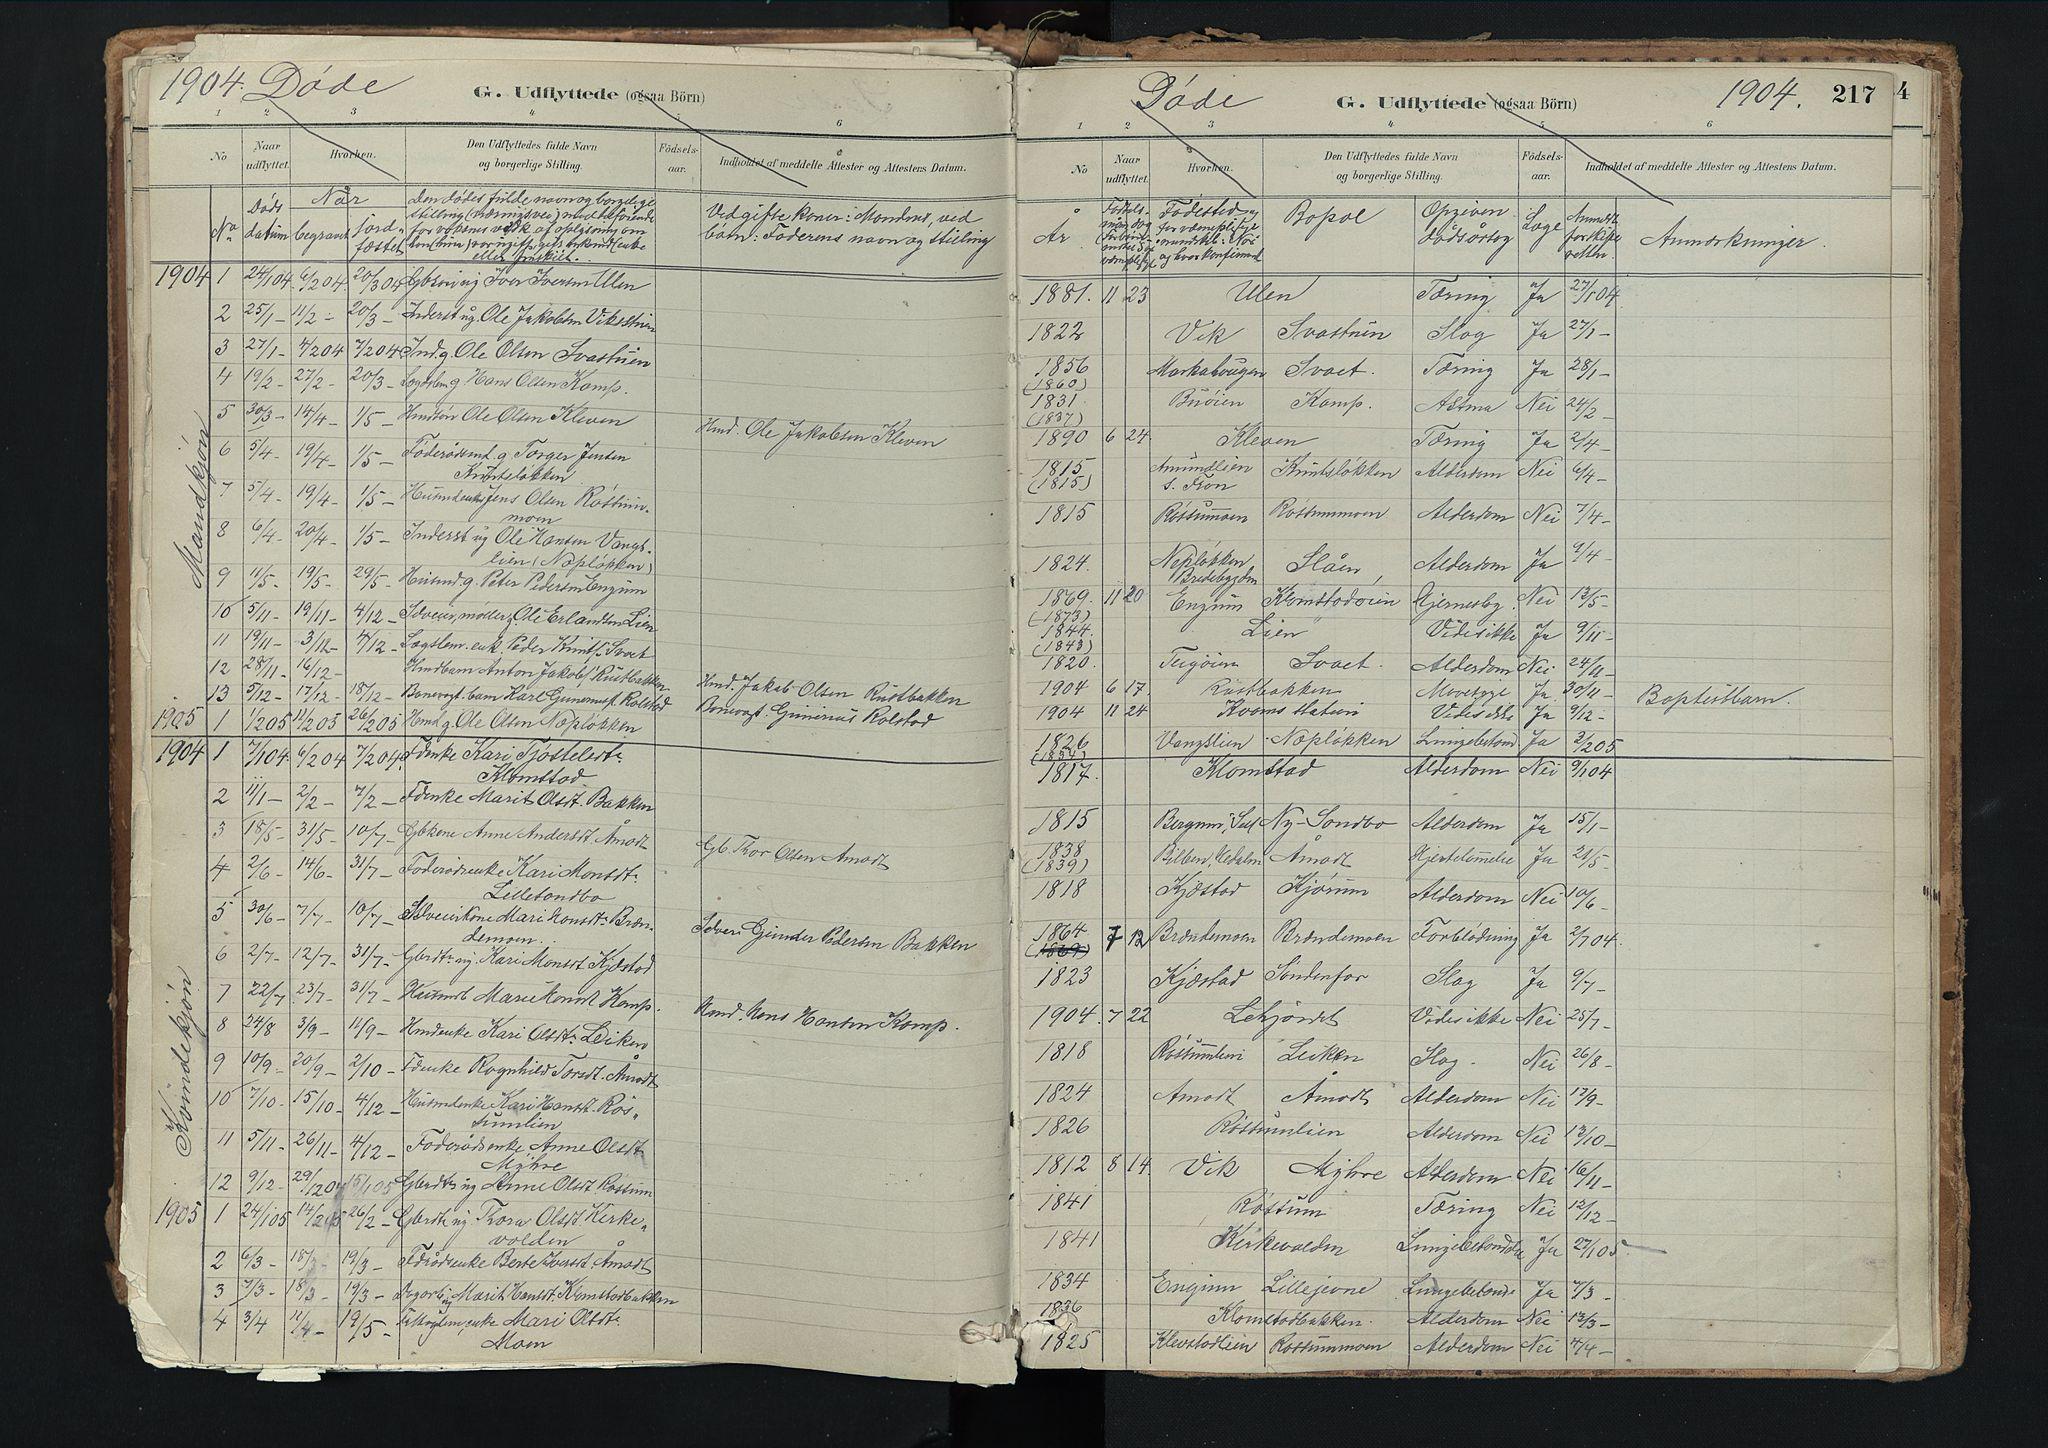 SAH, Nord-Fron prestekontor, Ministerialbok nr. 3, 1884-1914, s. 217